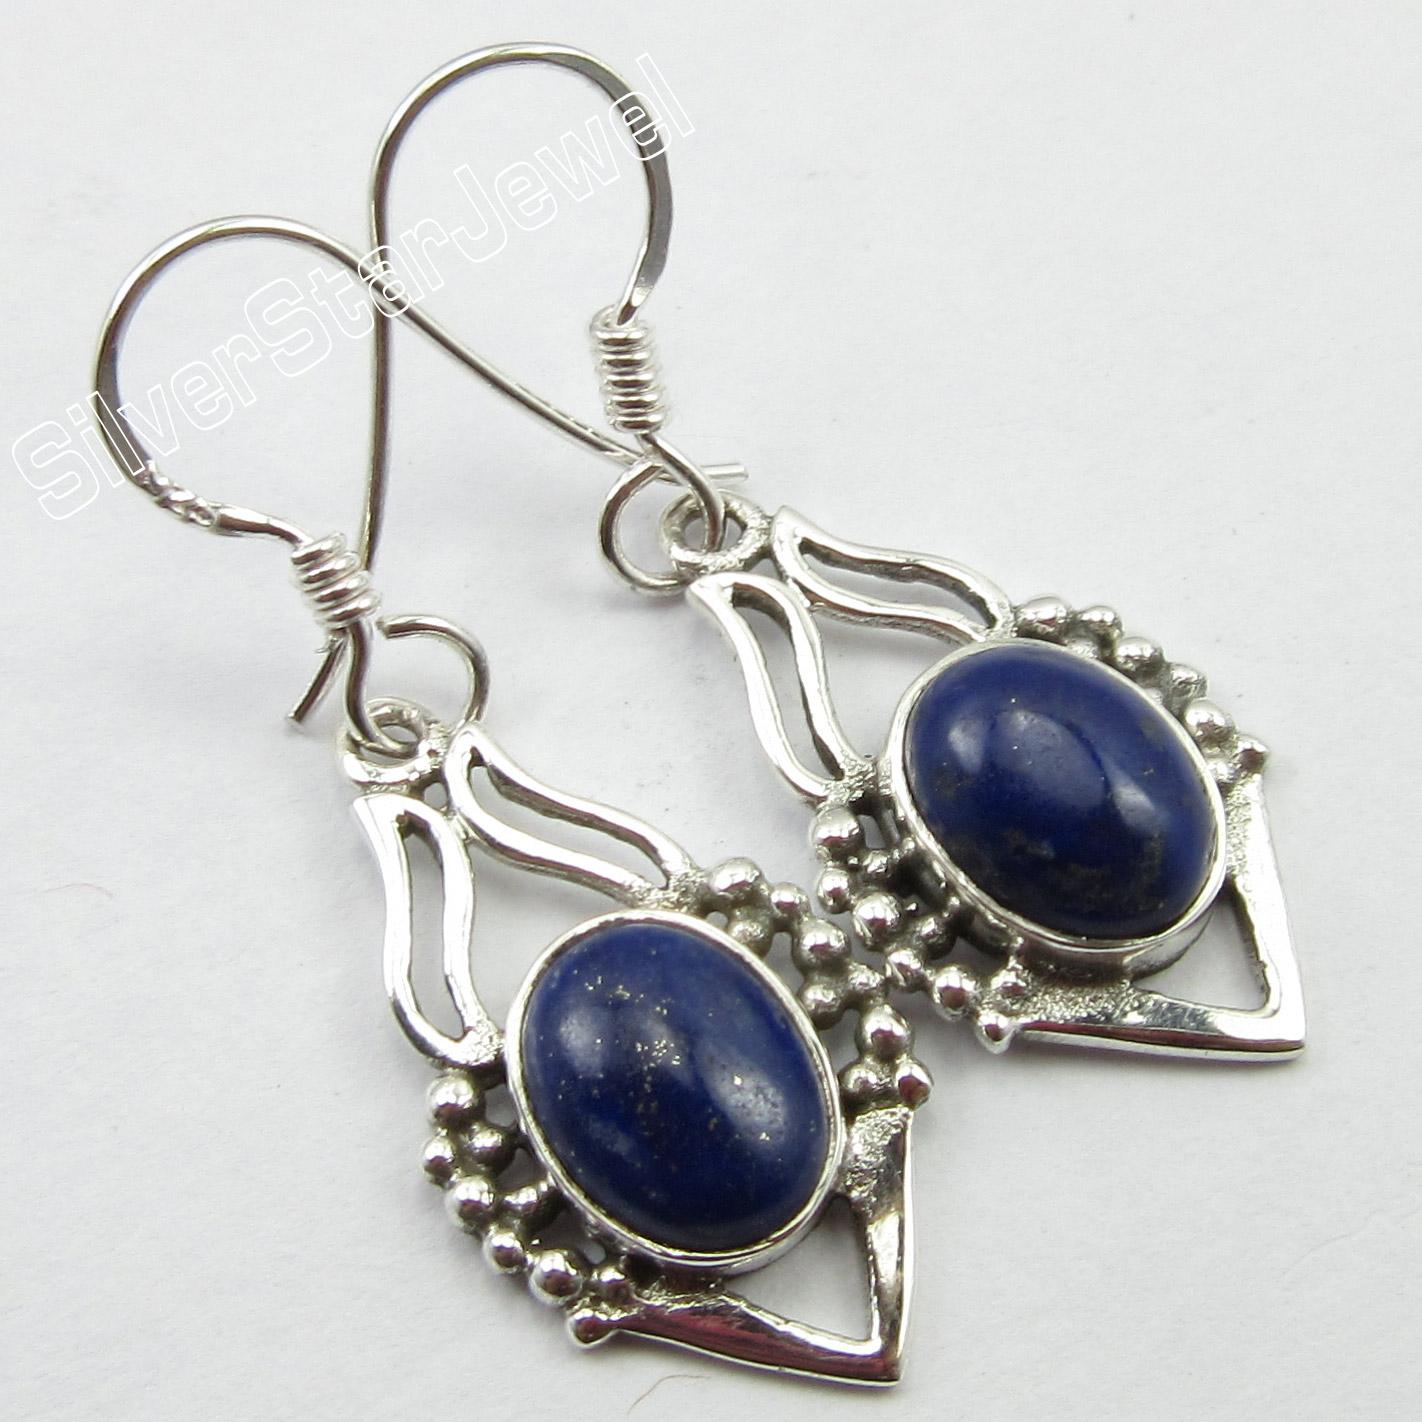 EXTRA-ORDINARY-Earrings-3-6-CM-925-Pure-Silver-LAPIS-LAZULI-Jewelry-4-0-GRAMS